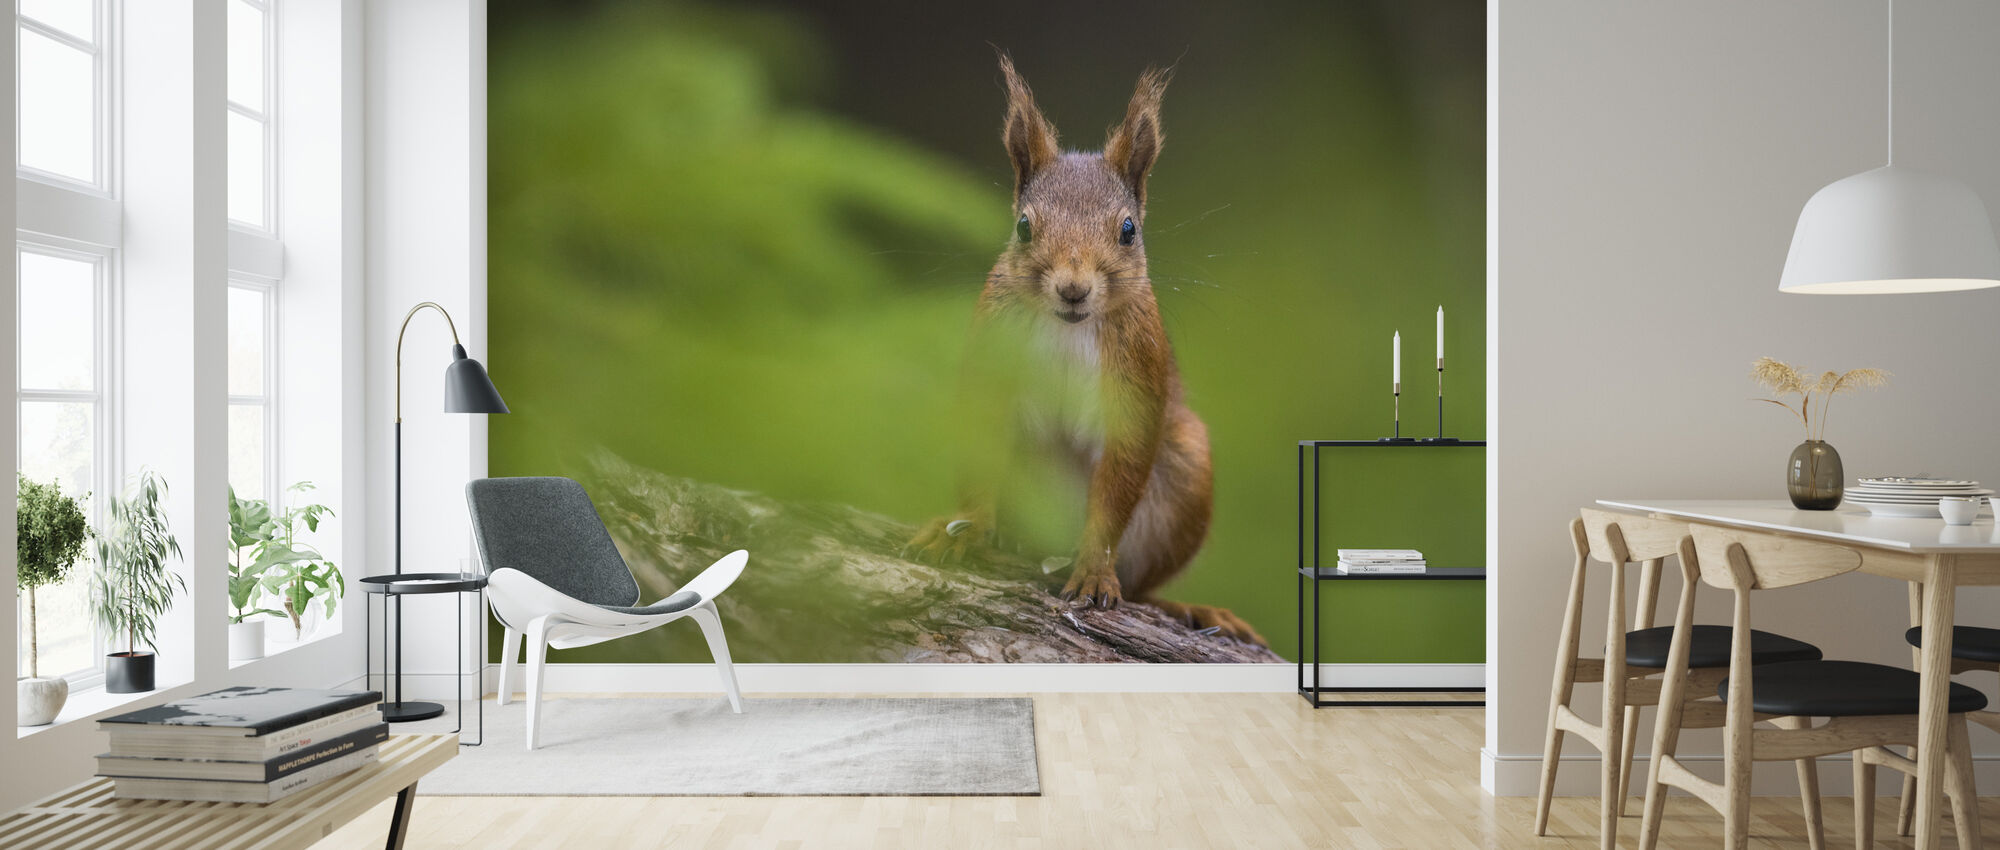 Orava II - Tapetti - Olohuone